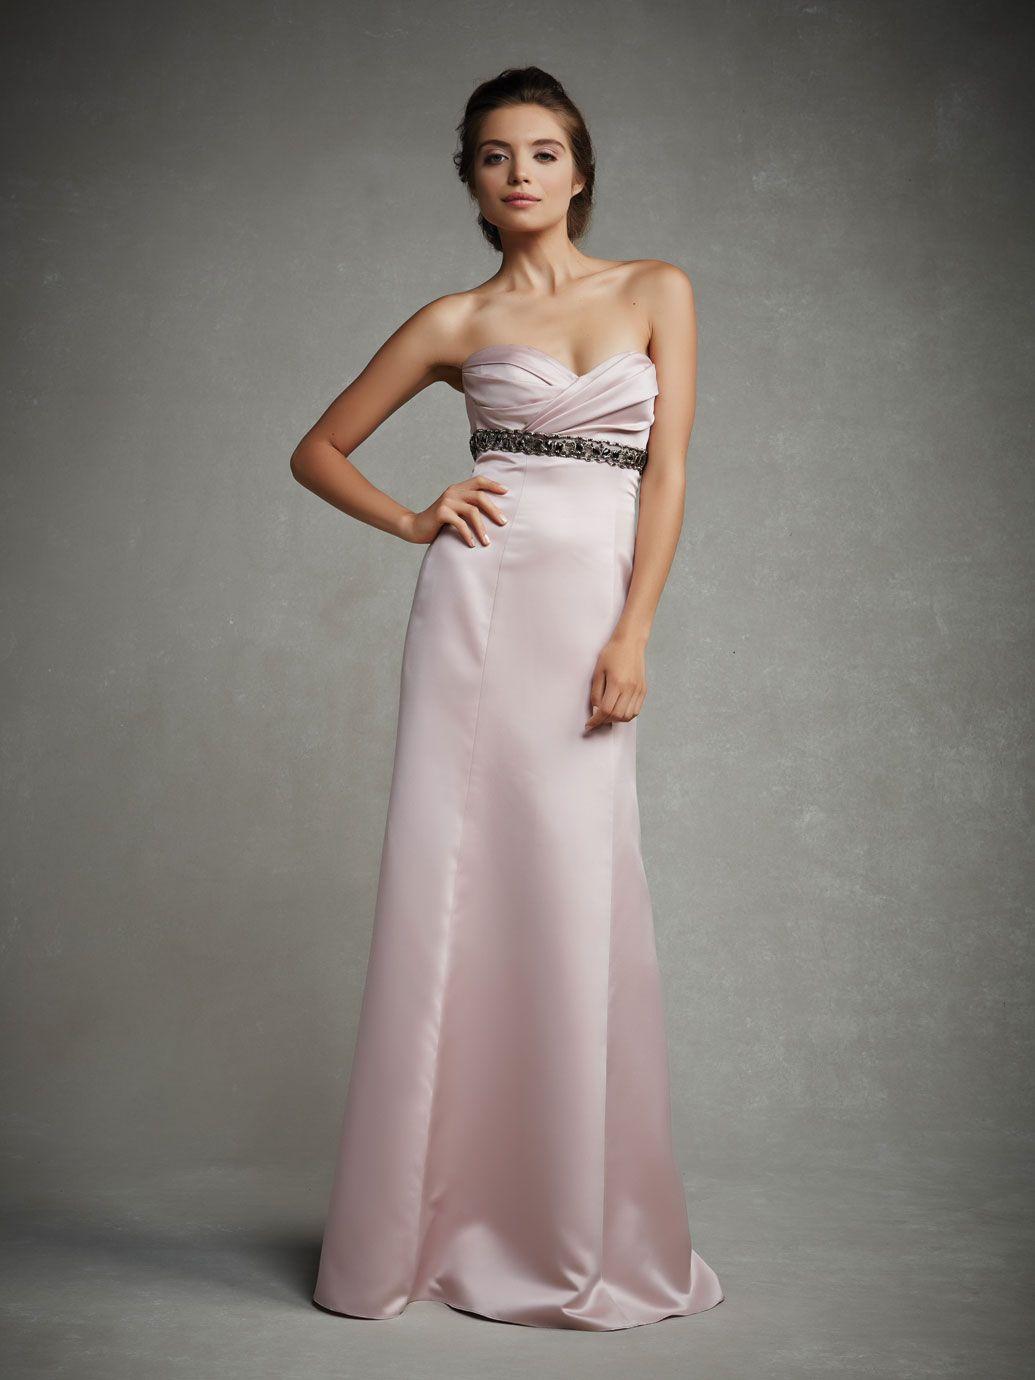 G10 enzoani enzoani love pinterest explore bridesmaid gowns bridesmaids and more ombrellifo Gallery